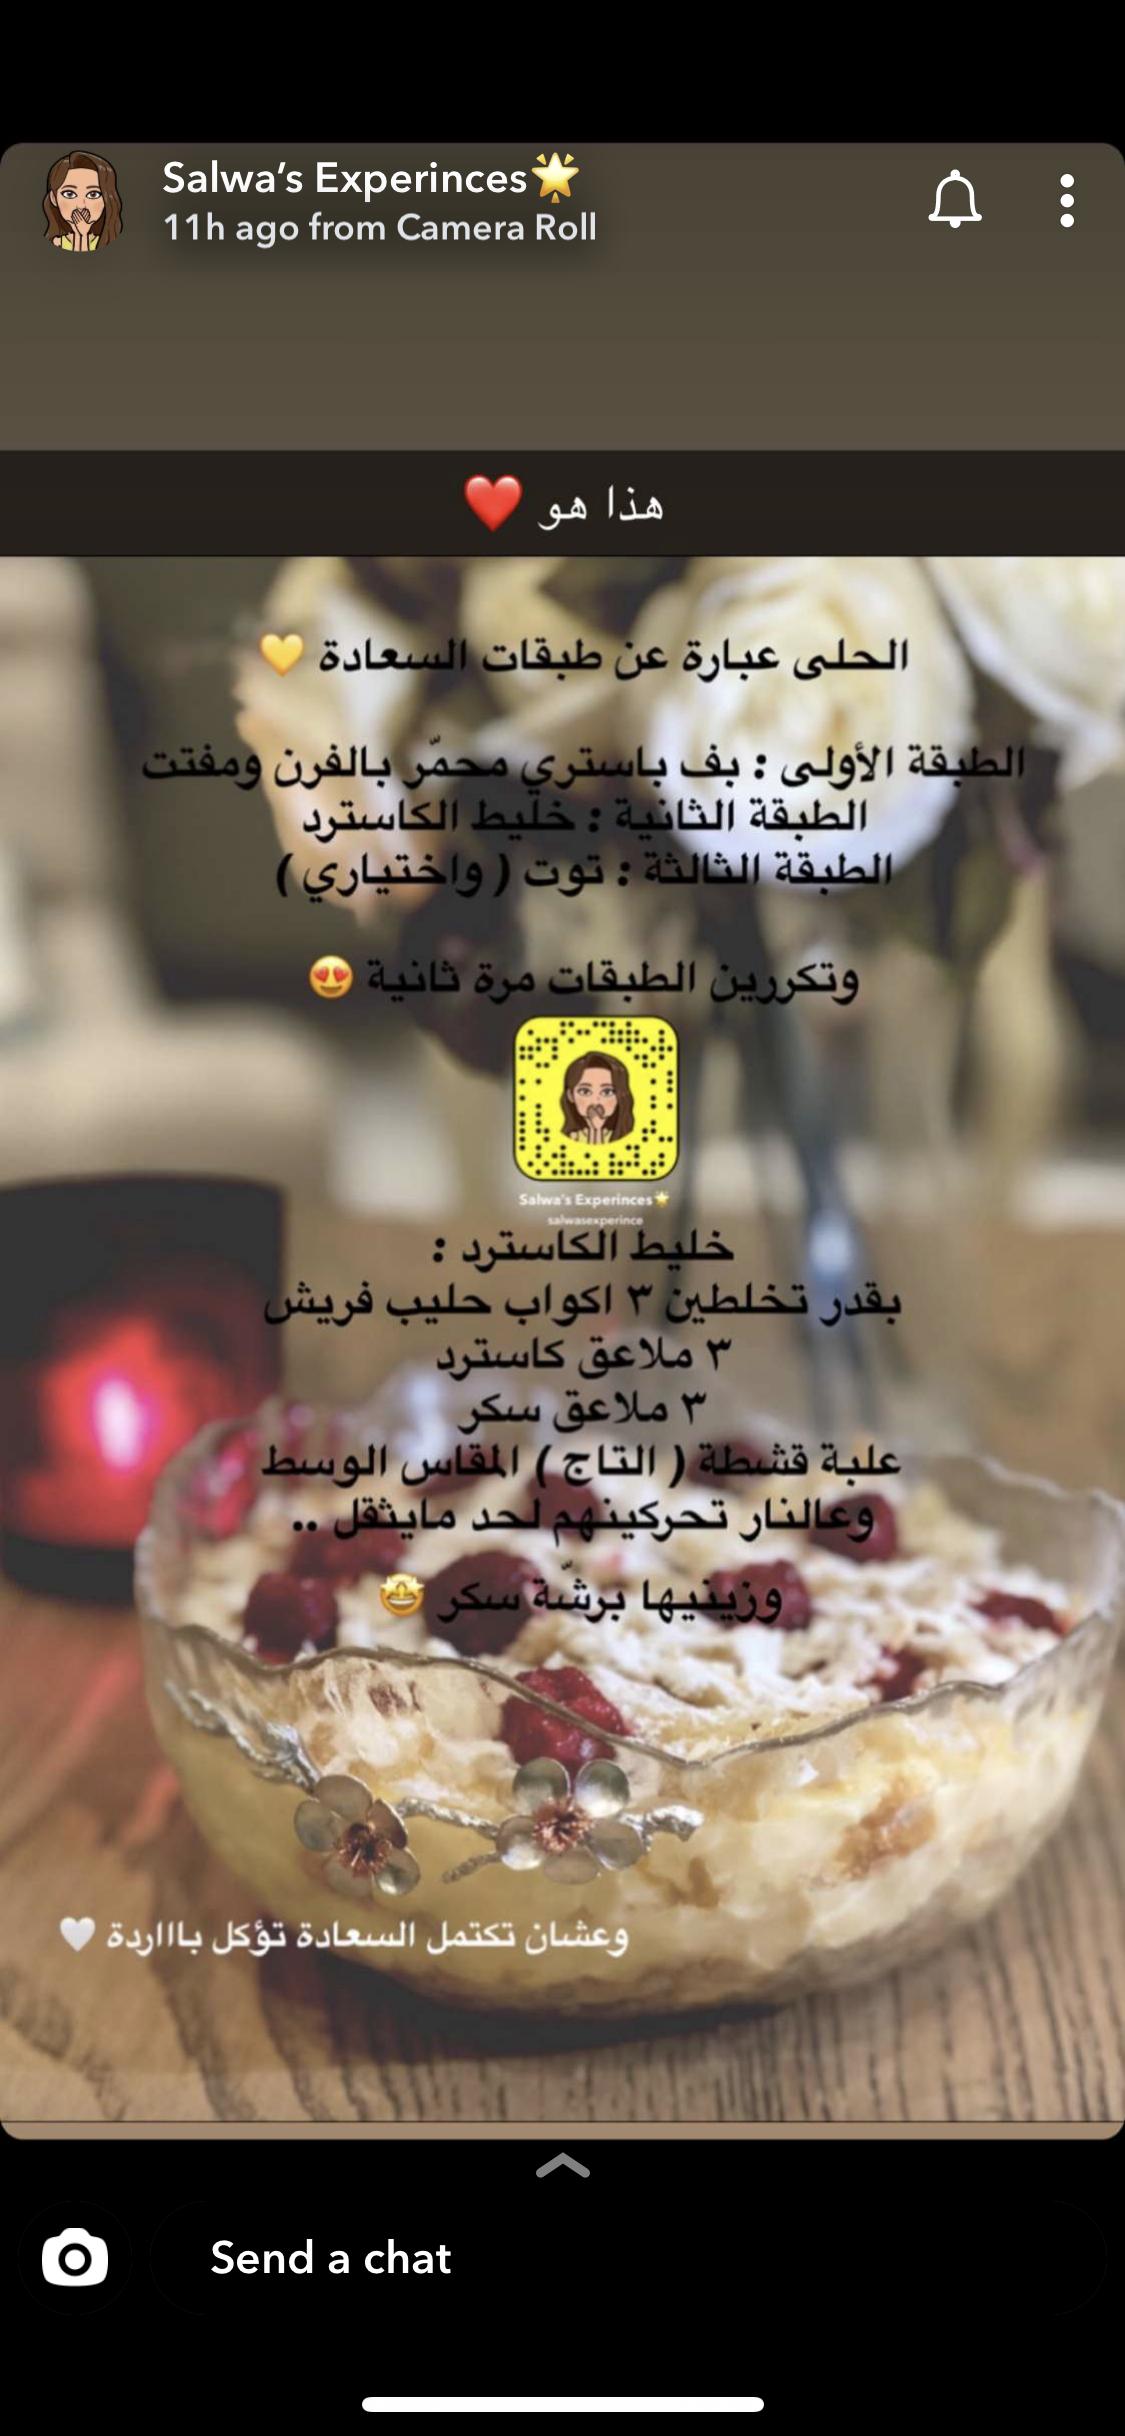 Pin By Tahani On حلويات Yummy Food Dessert Food Recipies Food To Make